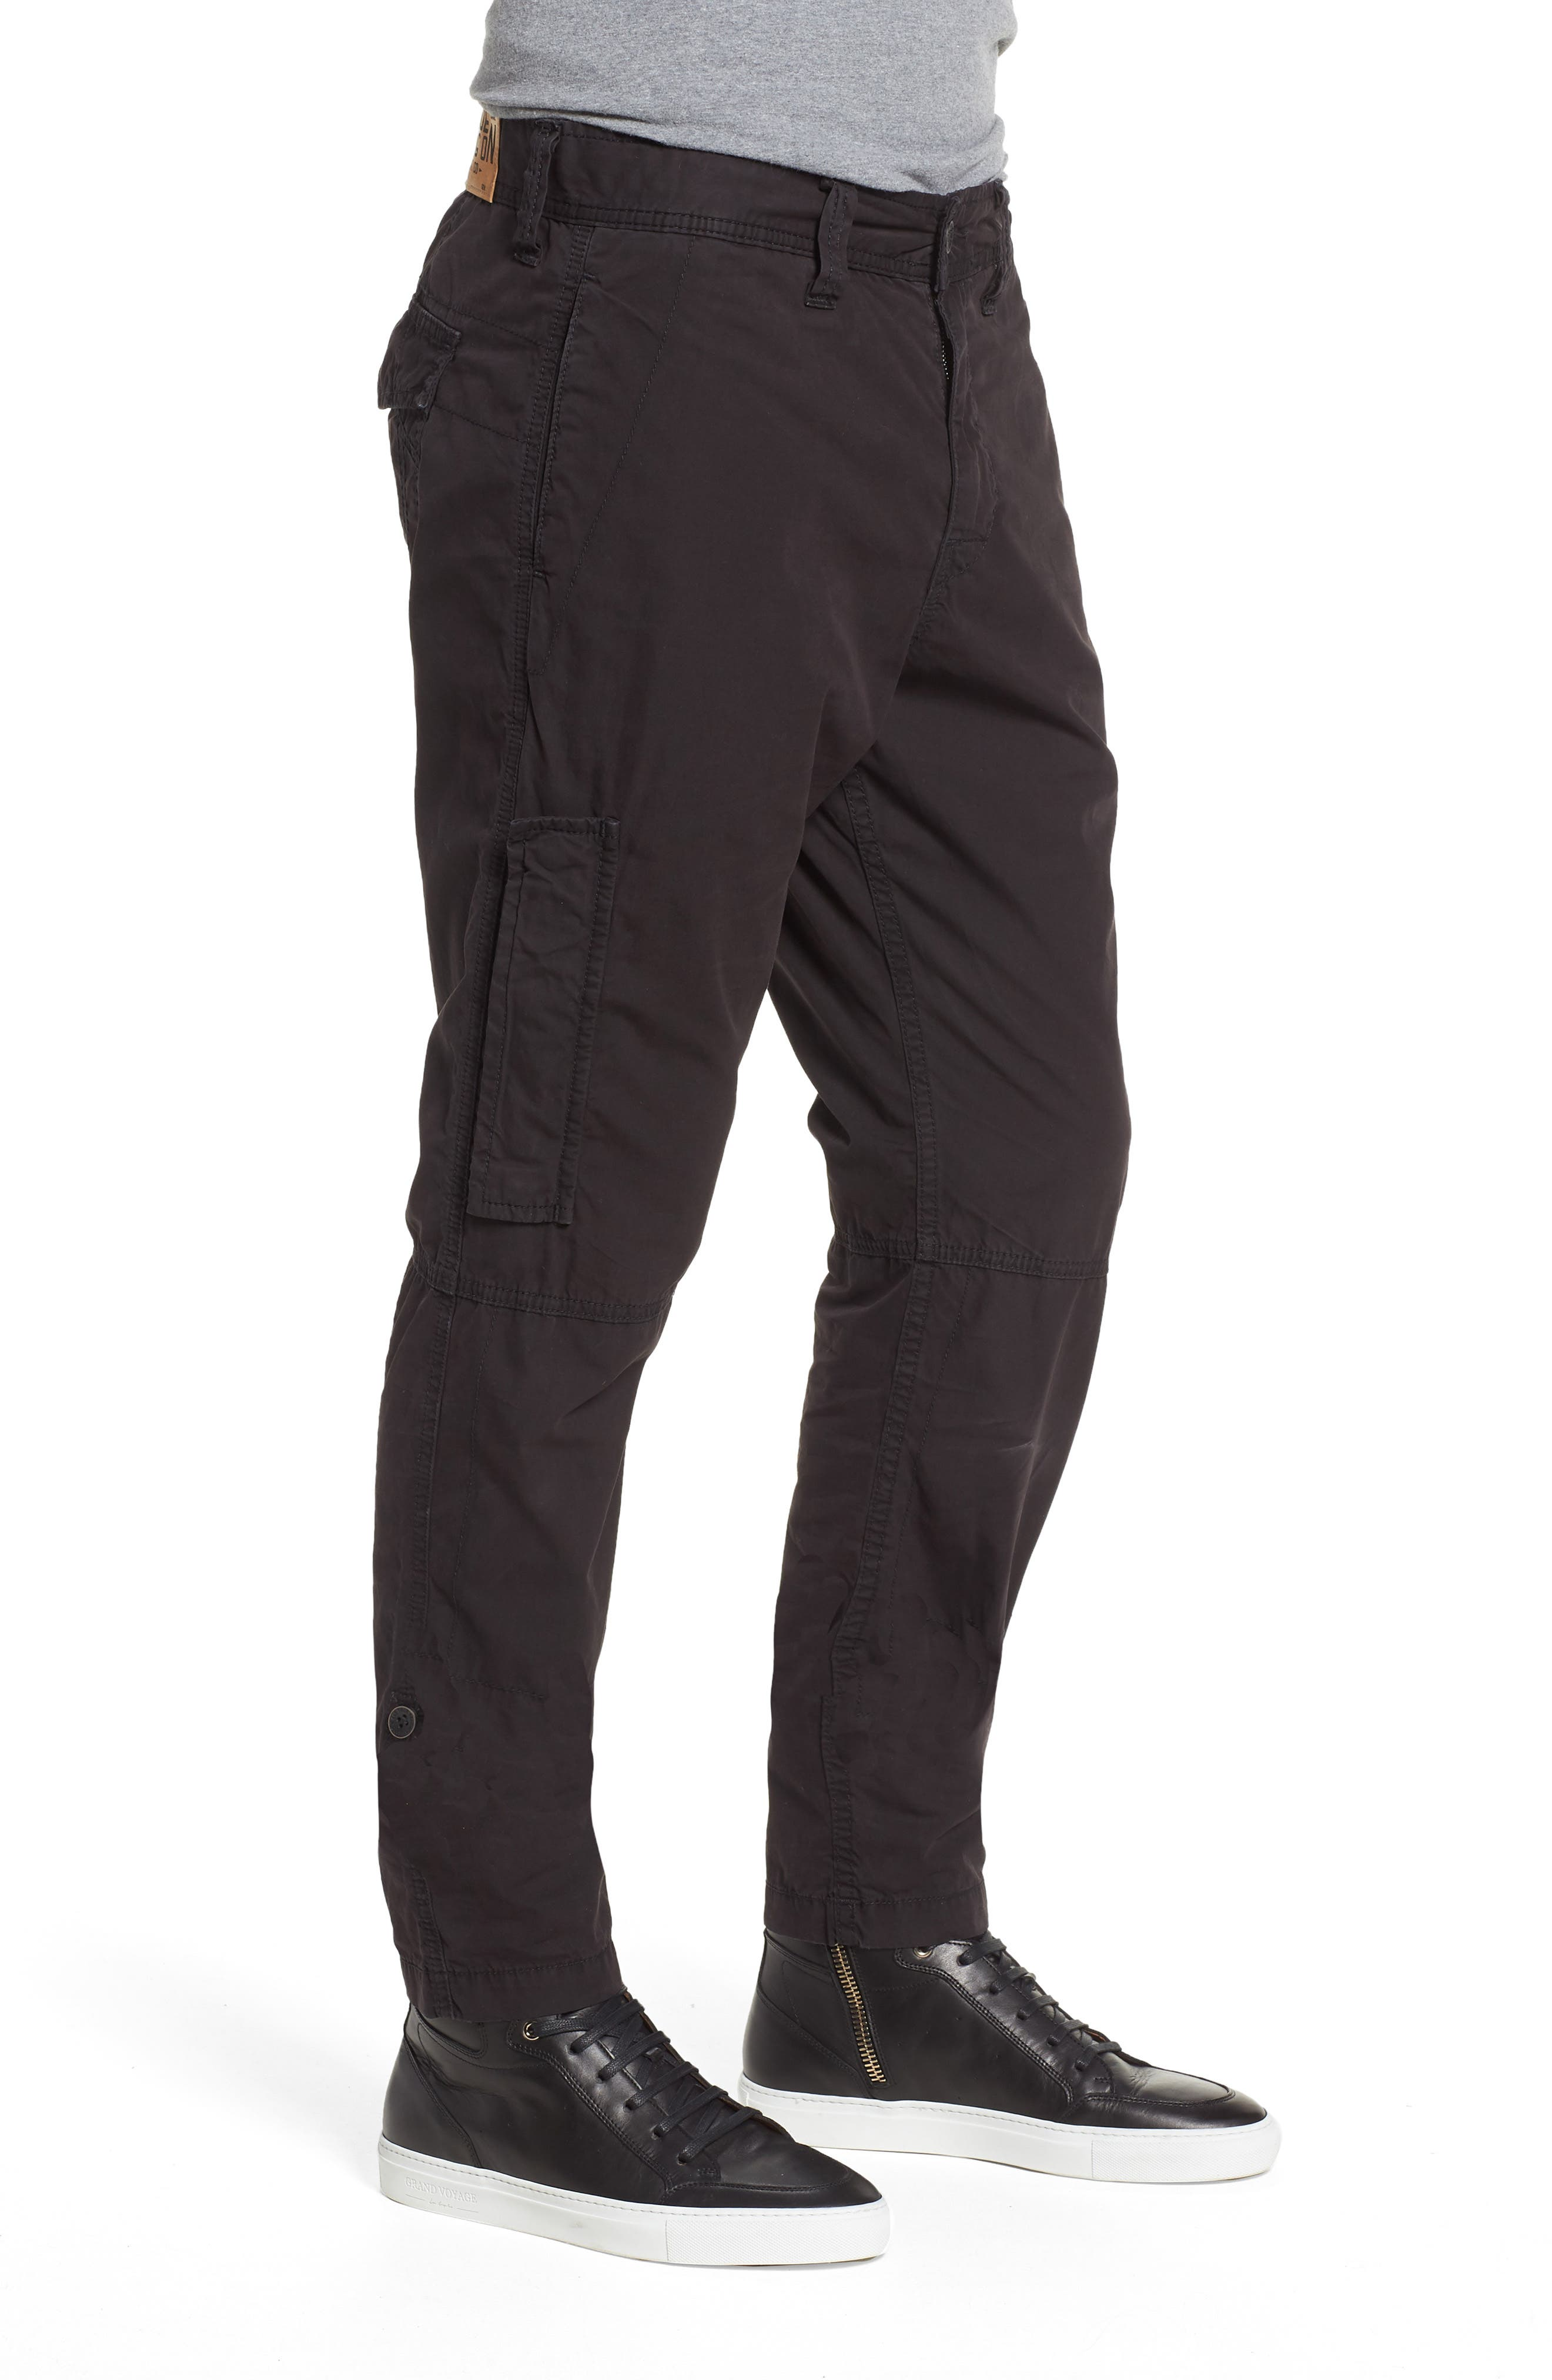 Officer Field Pants,                             Alternate thumbnail 3, color,                             Black